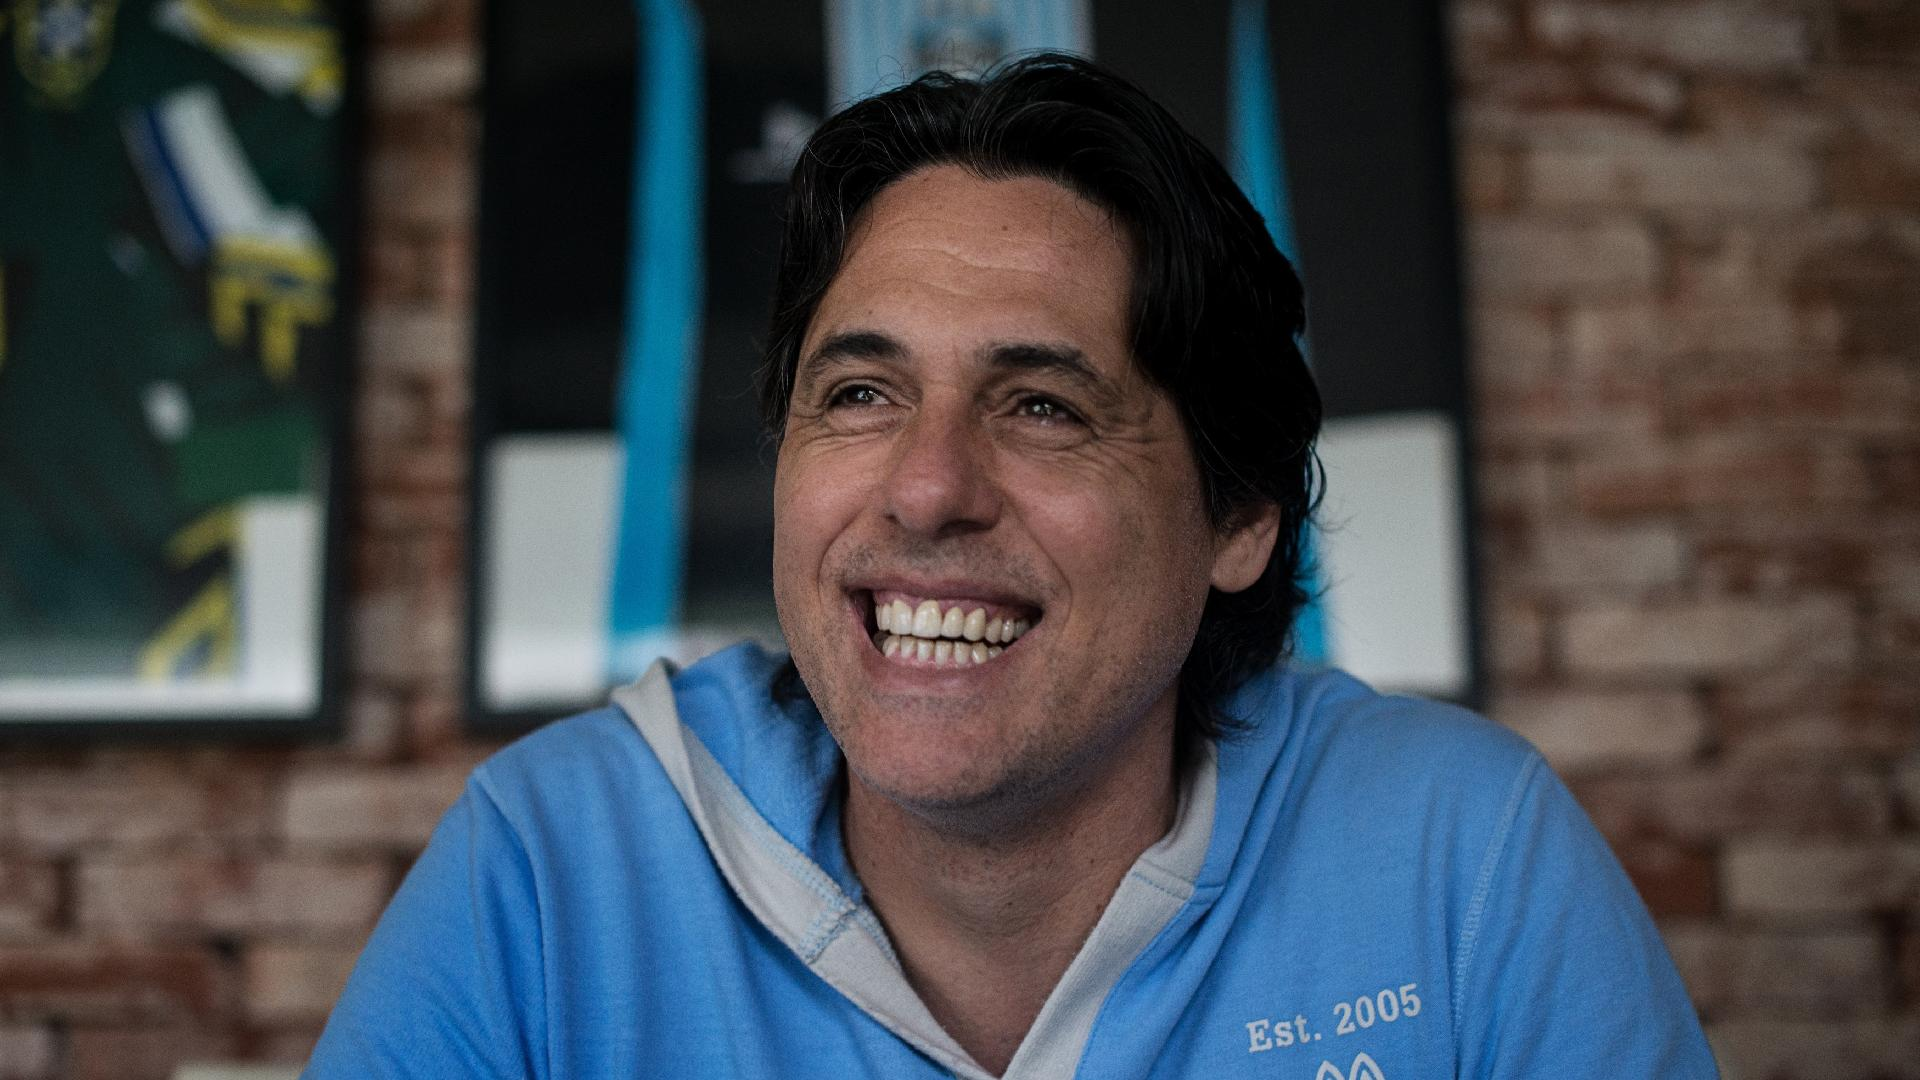 Tiago Coelho/UOL